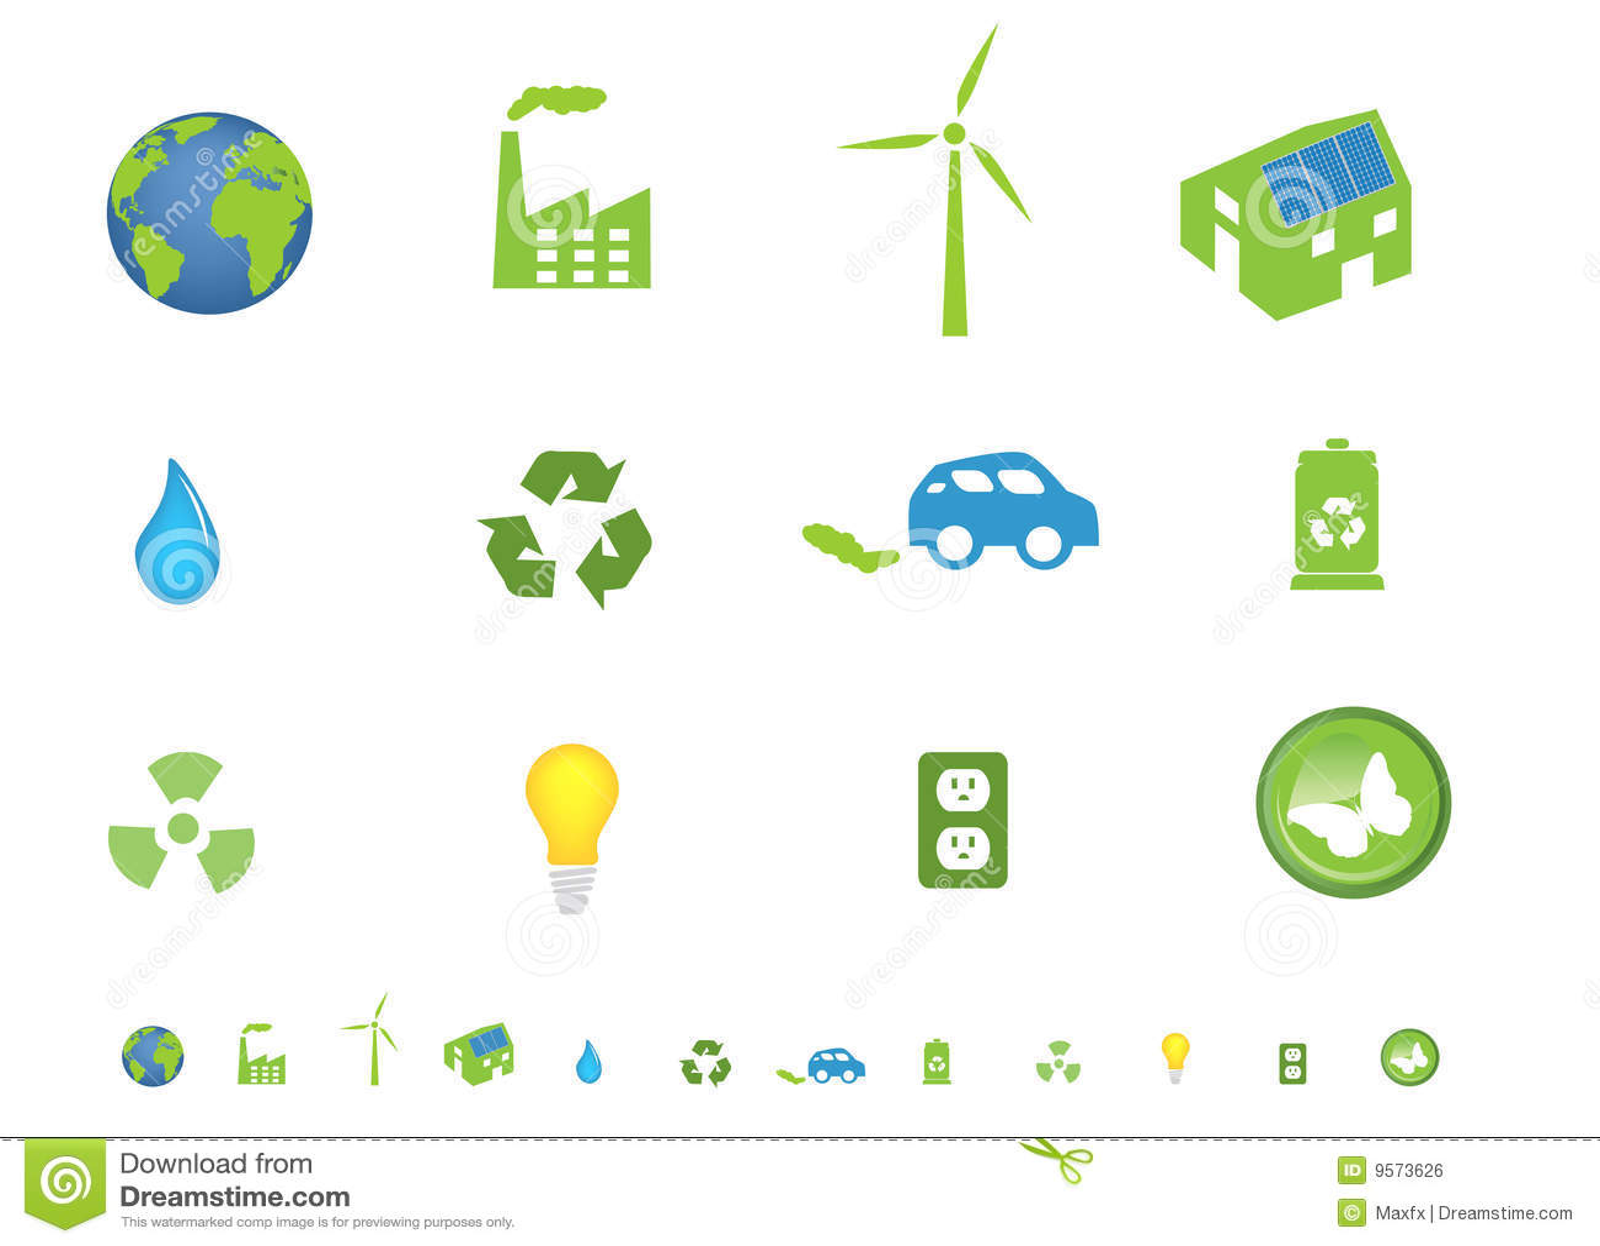 Environmental Symbols Icon Set Stock Vector Illustration